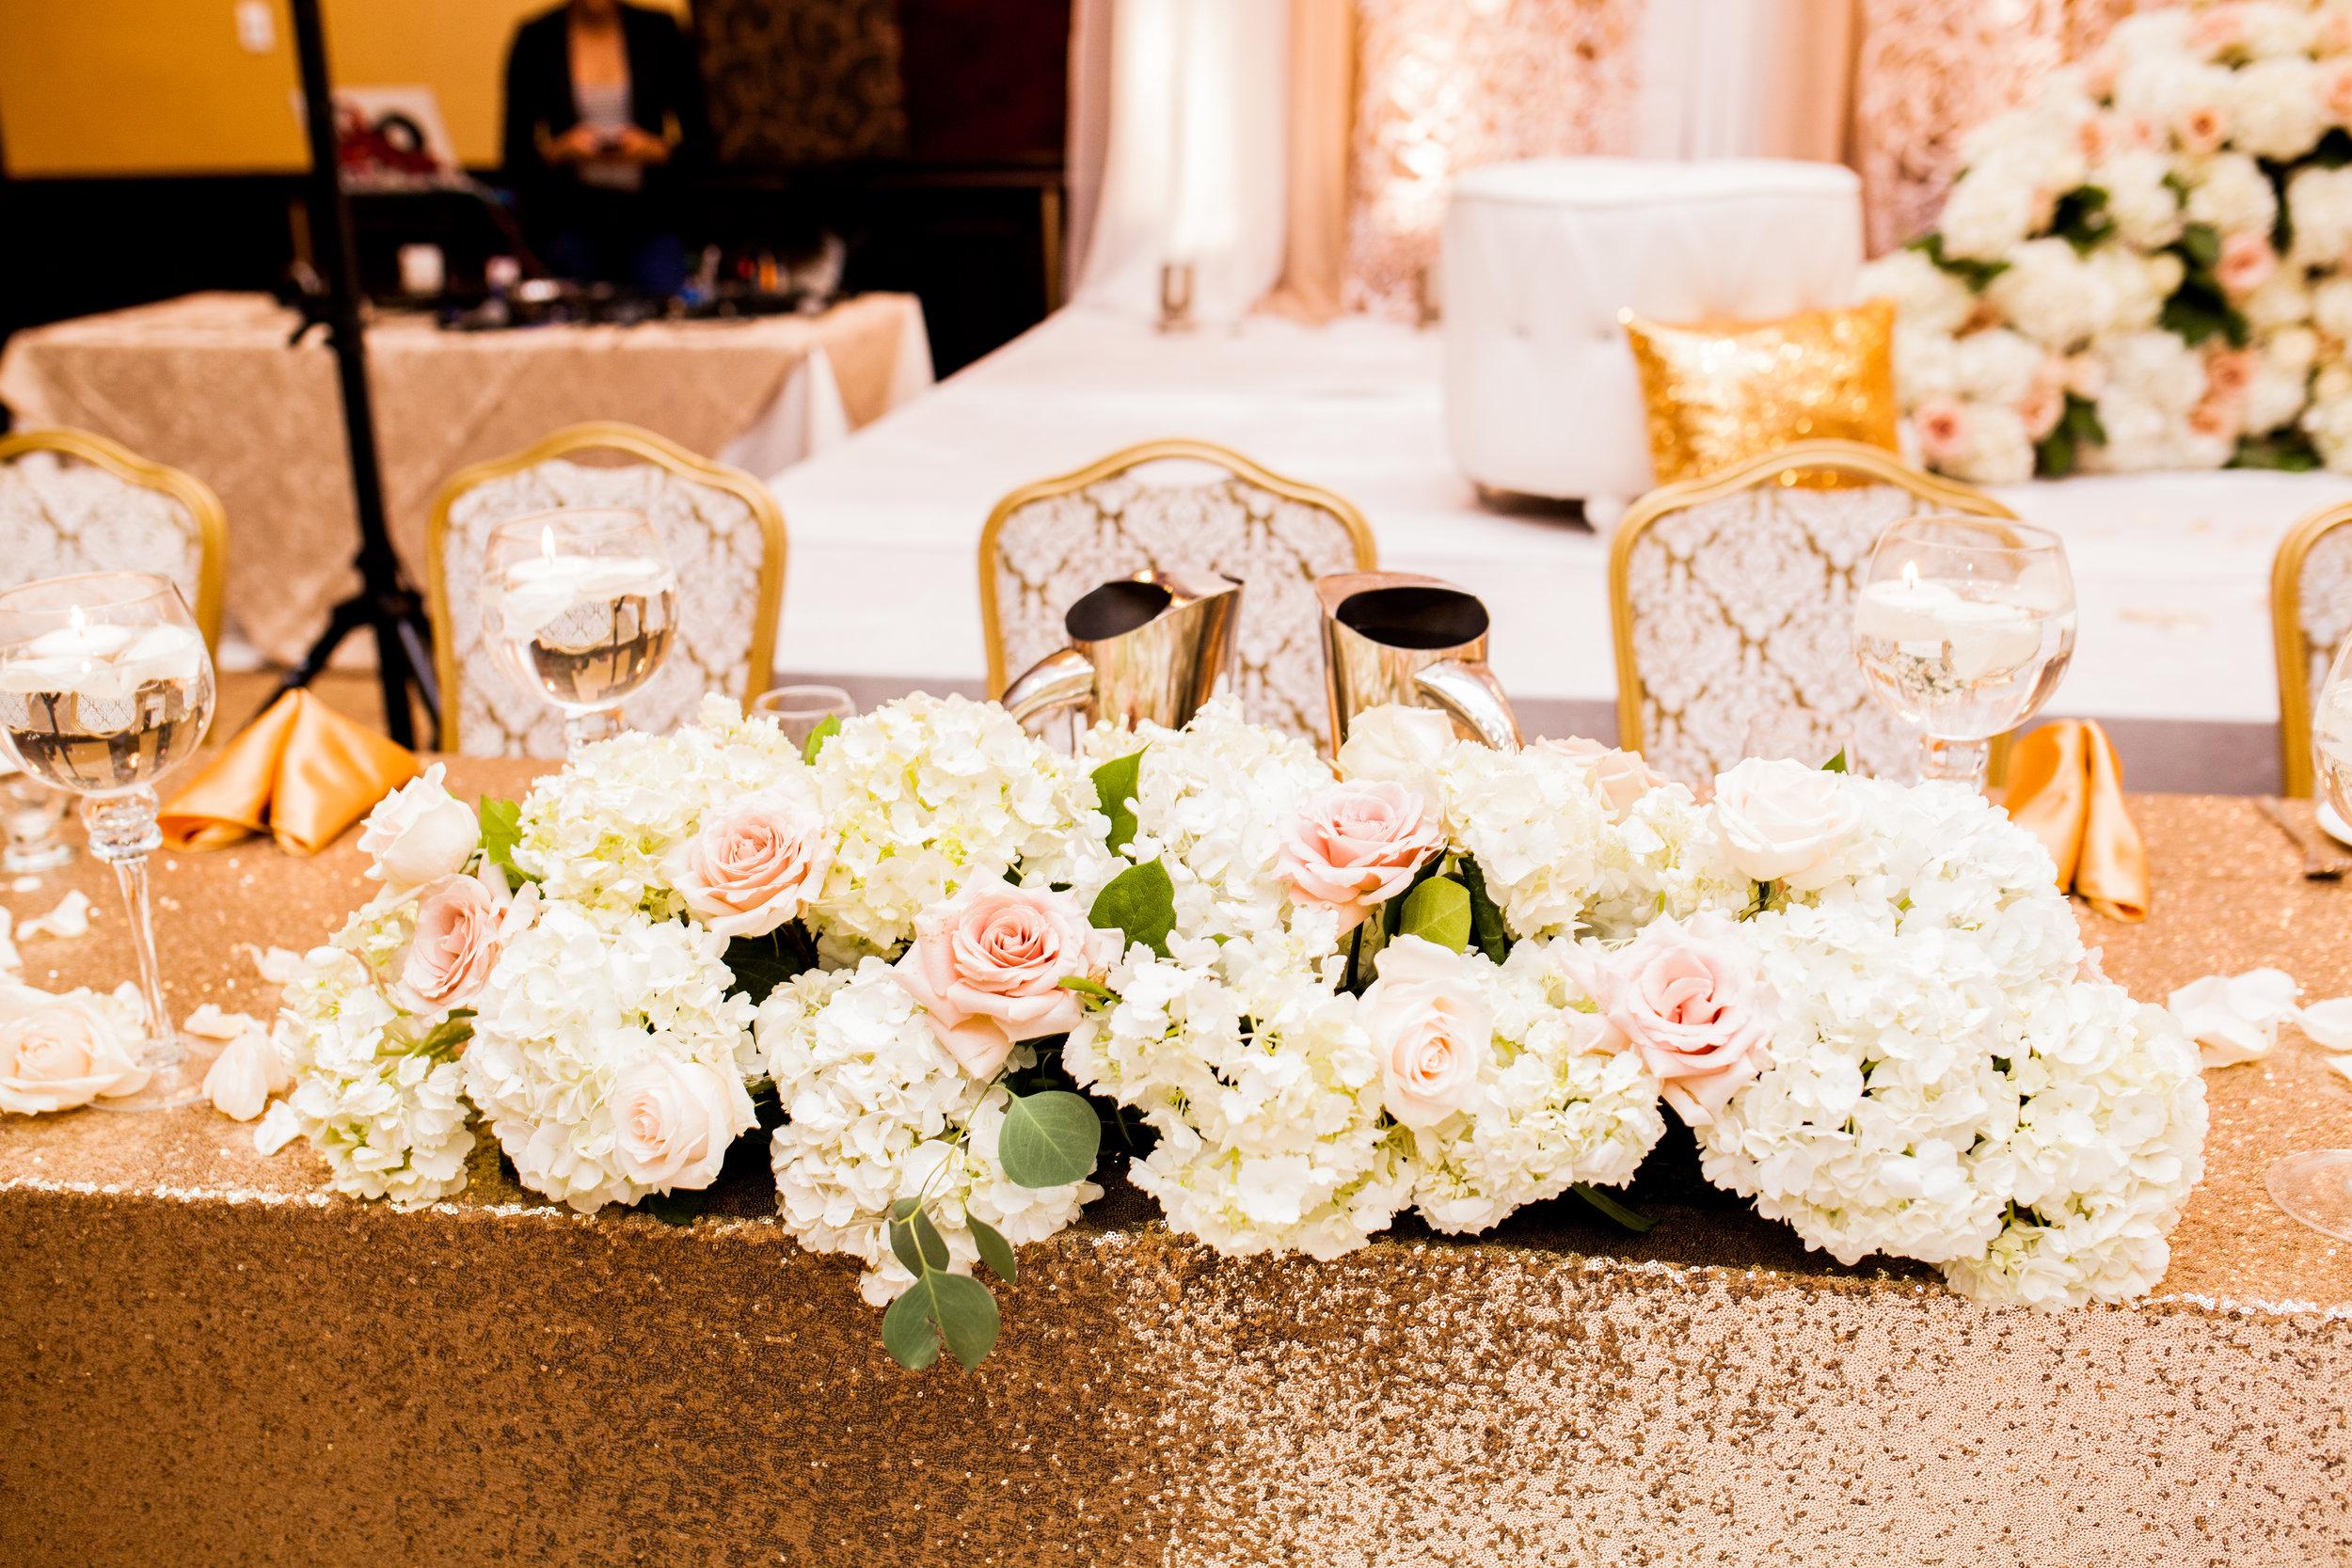 Somali Wedding Weddings by Sultana Decor and Design